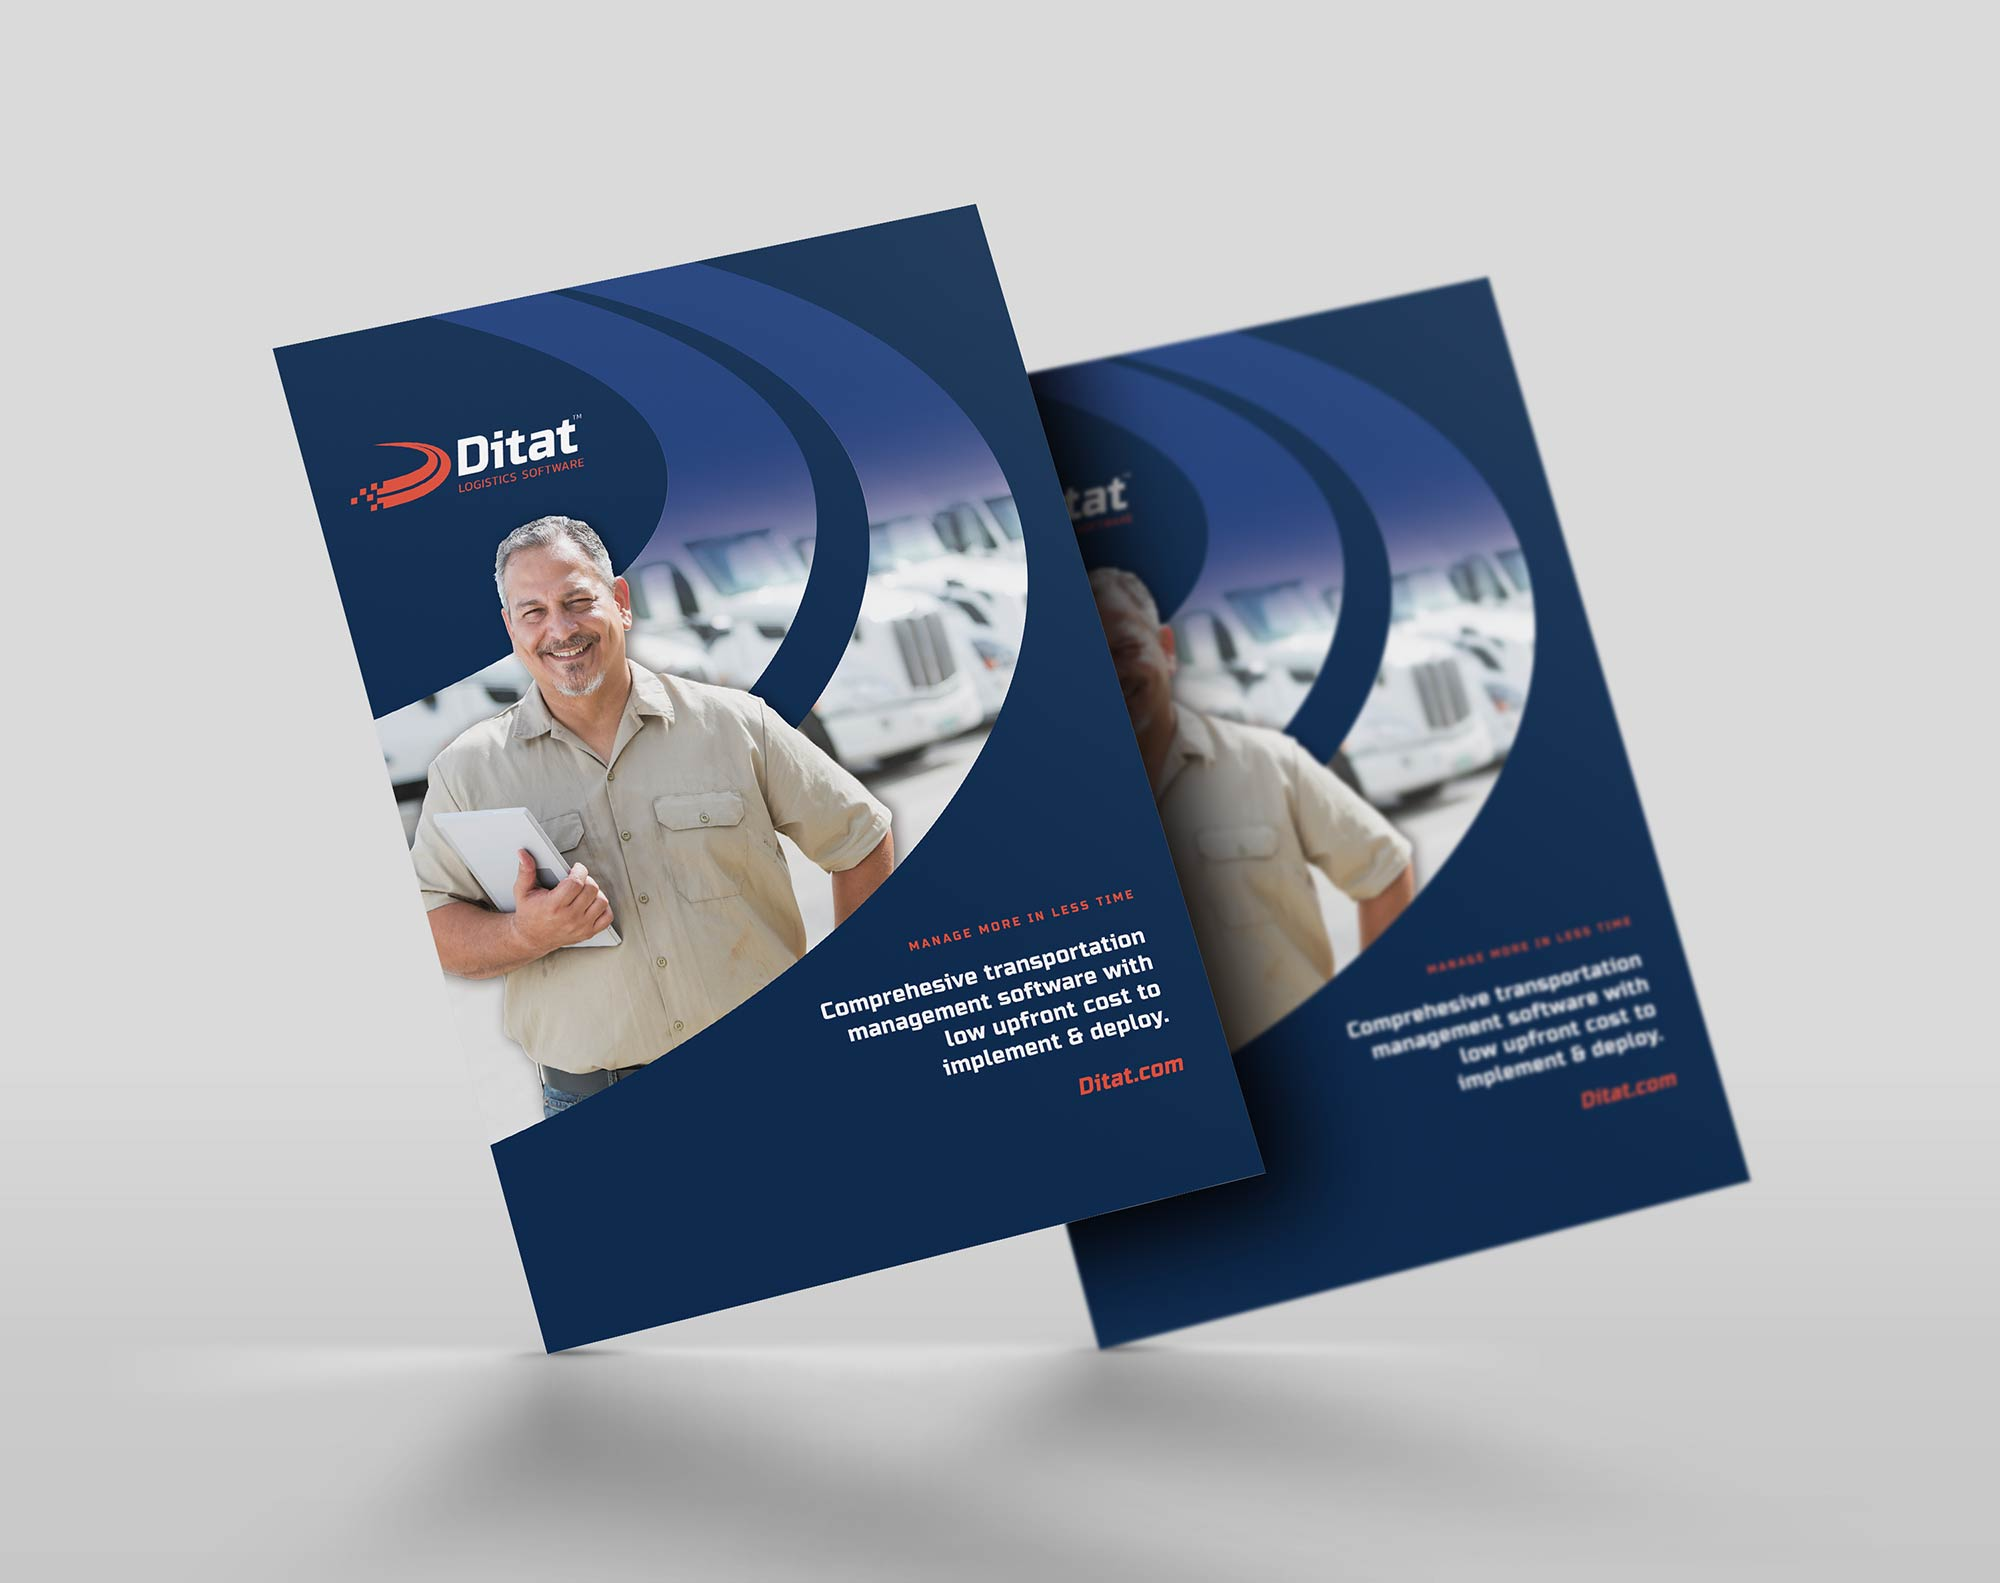 Ditat folder design